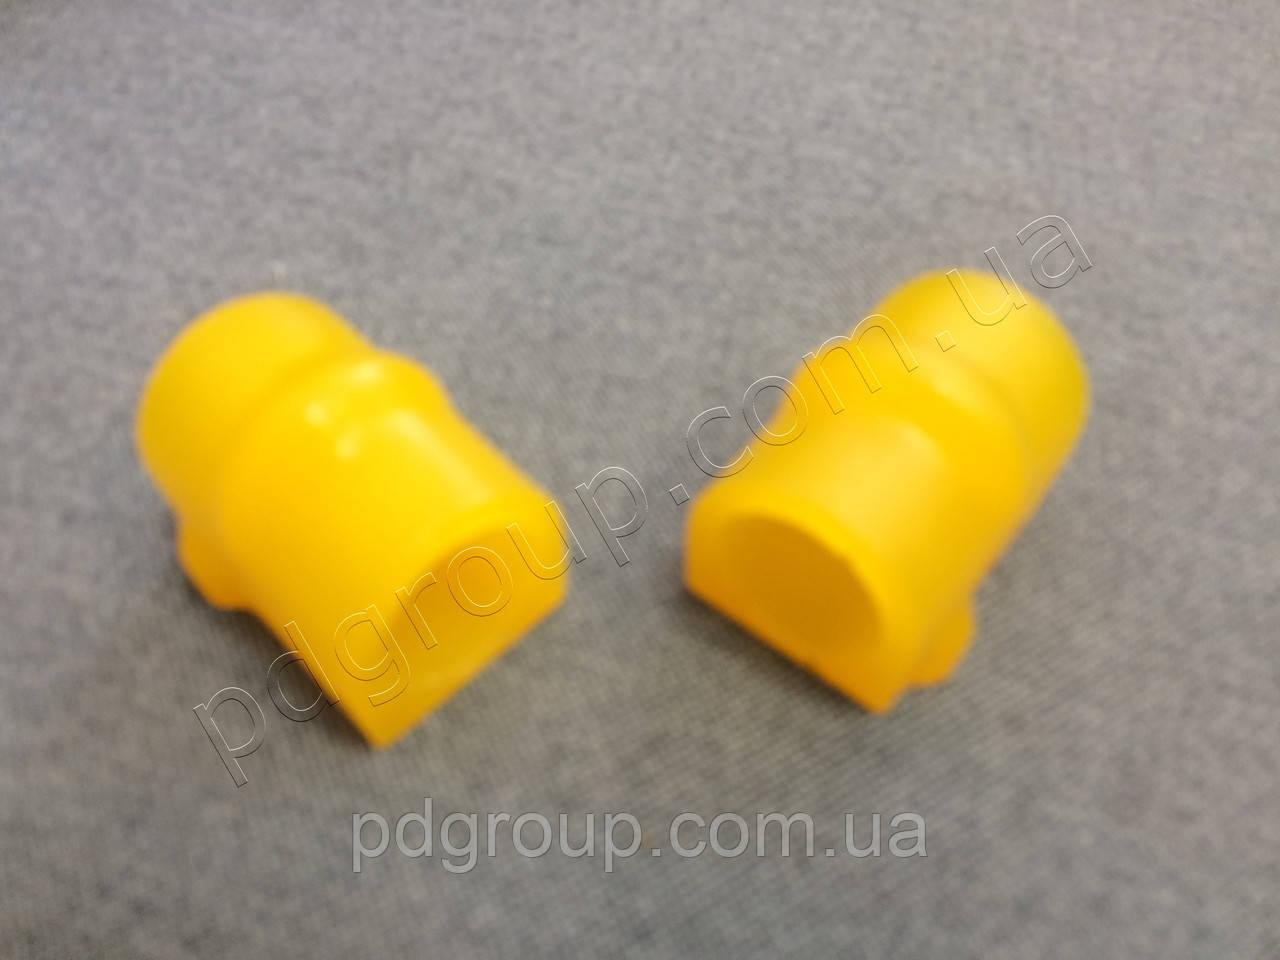 Втулка стабилизатора переднего d=21мм Opel Kadett E (OEM 03 50 120)